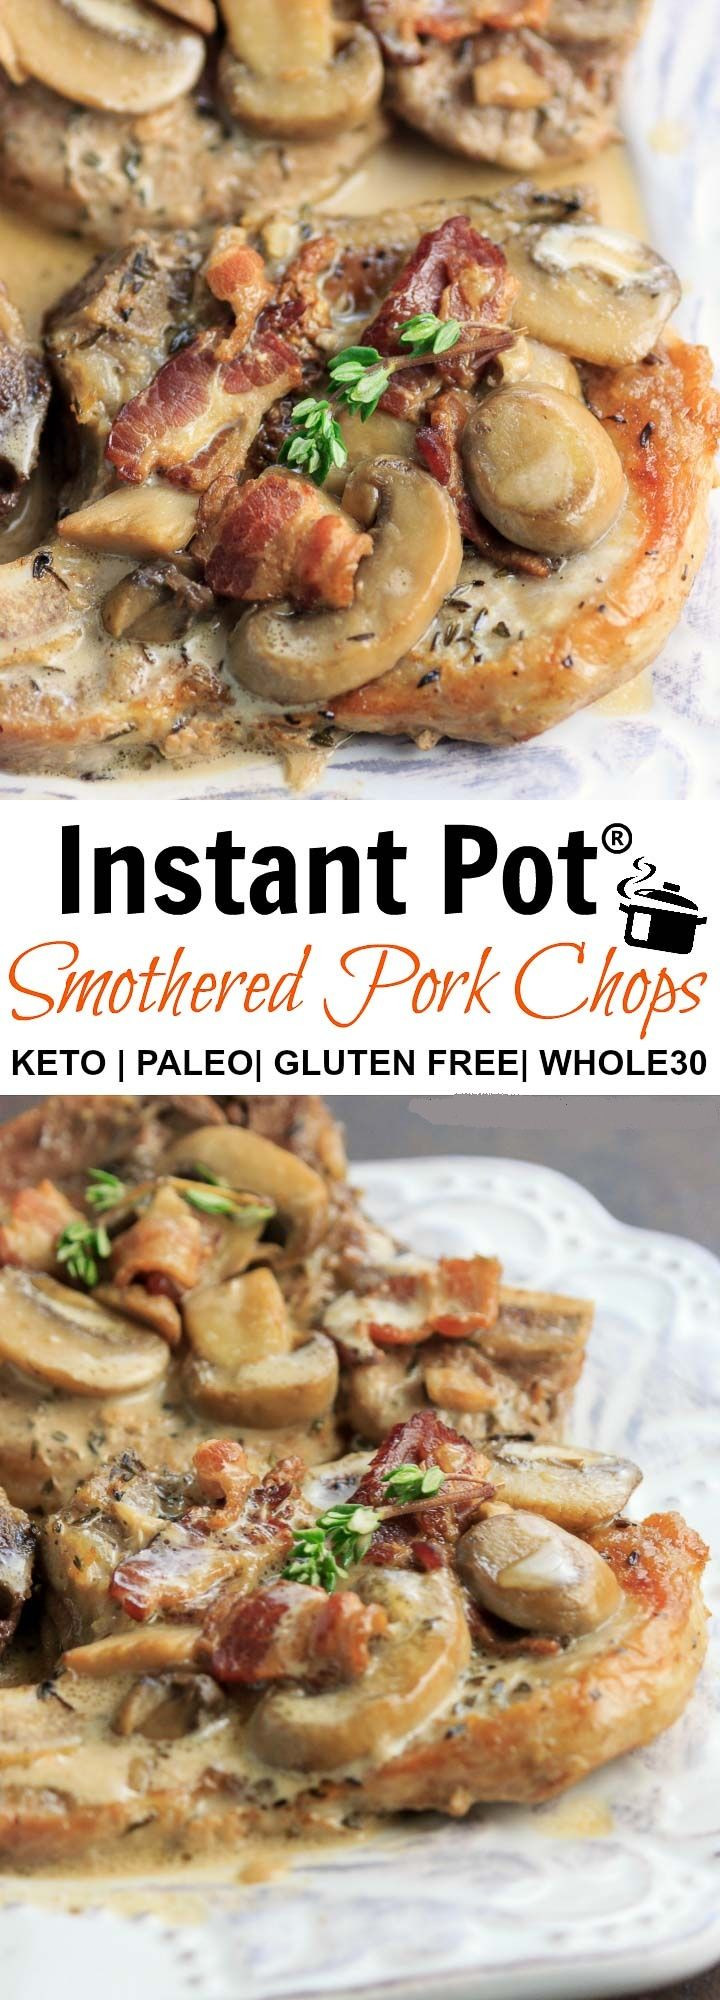 Smothered Pork Chops Crock Pot Keto  Keto Pork Chops Recipe – Creamy Ranch Pork Chops